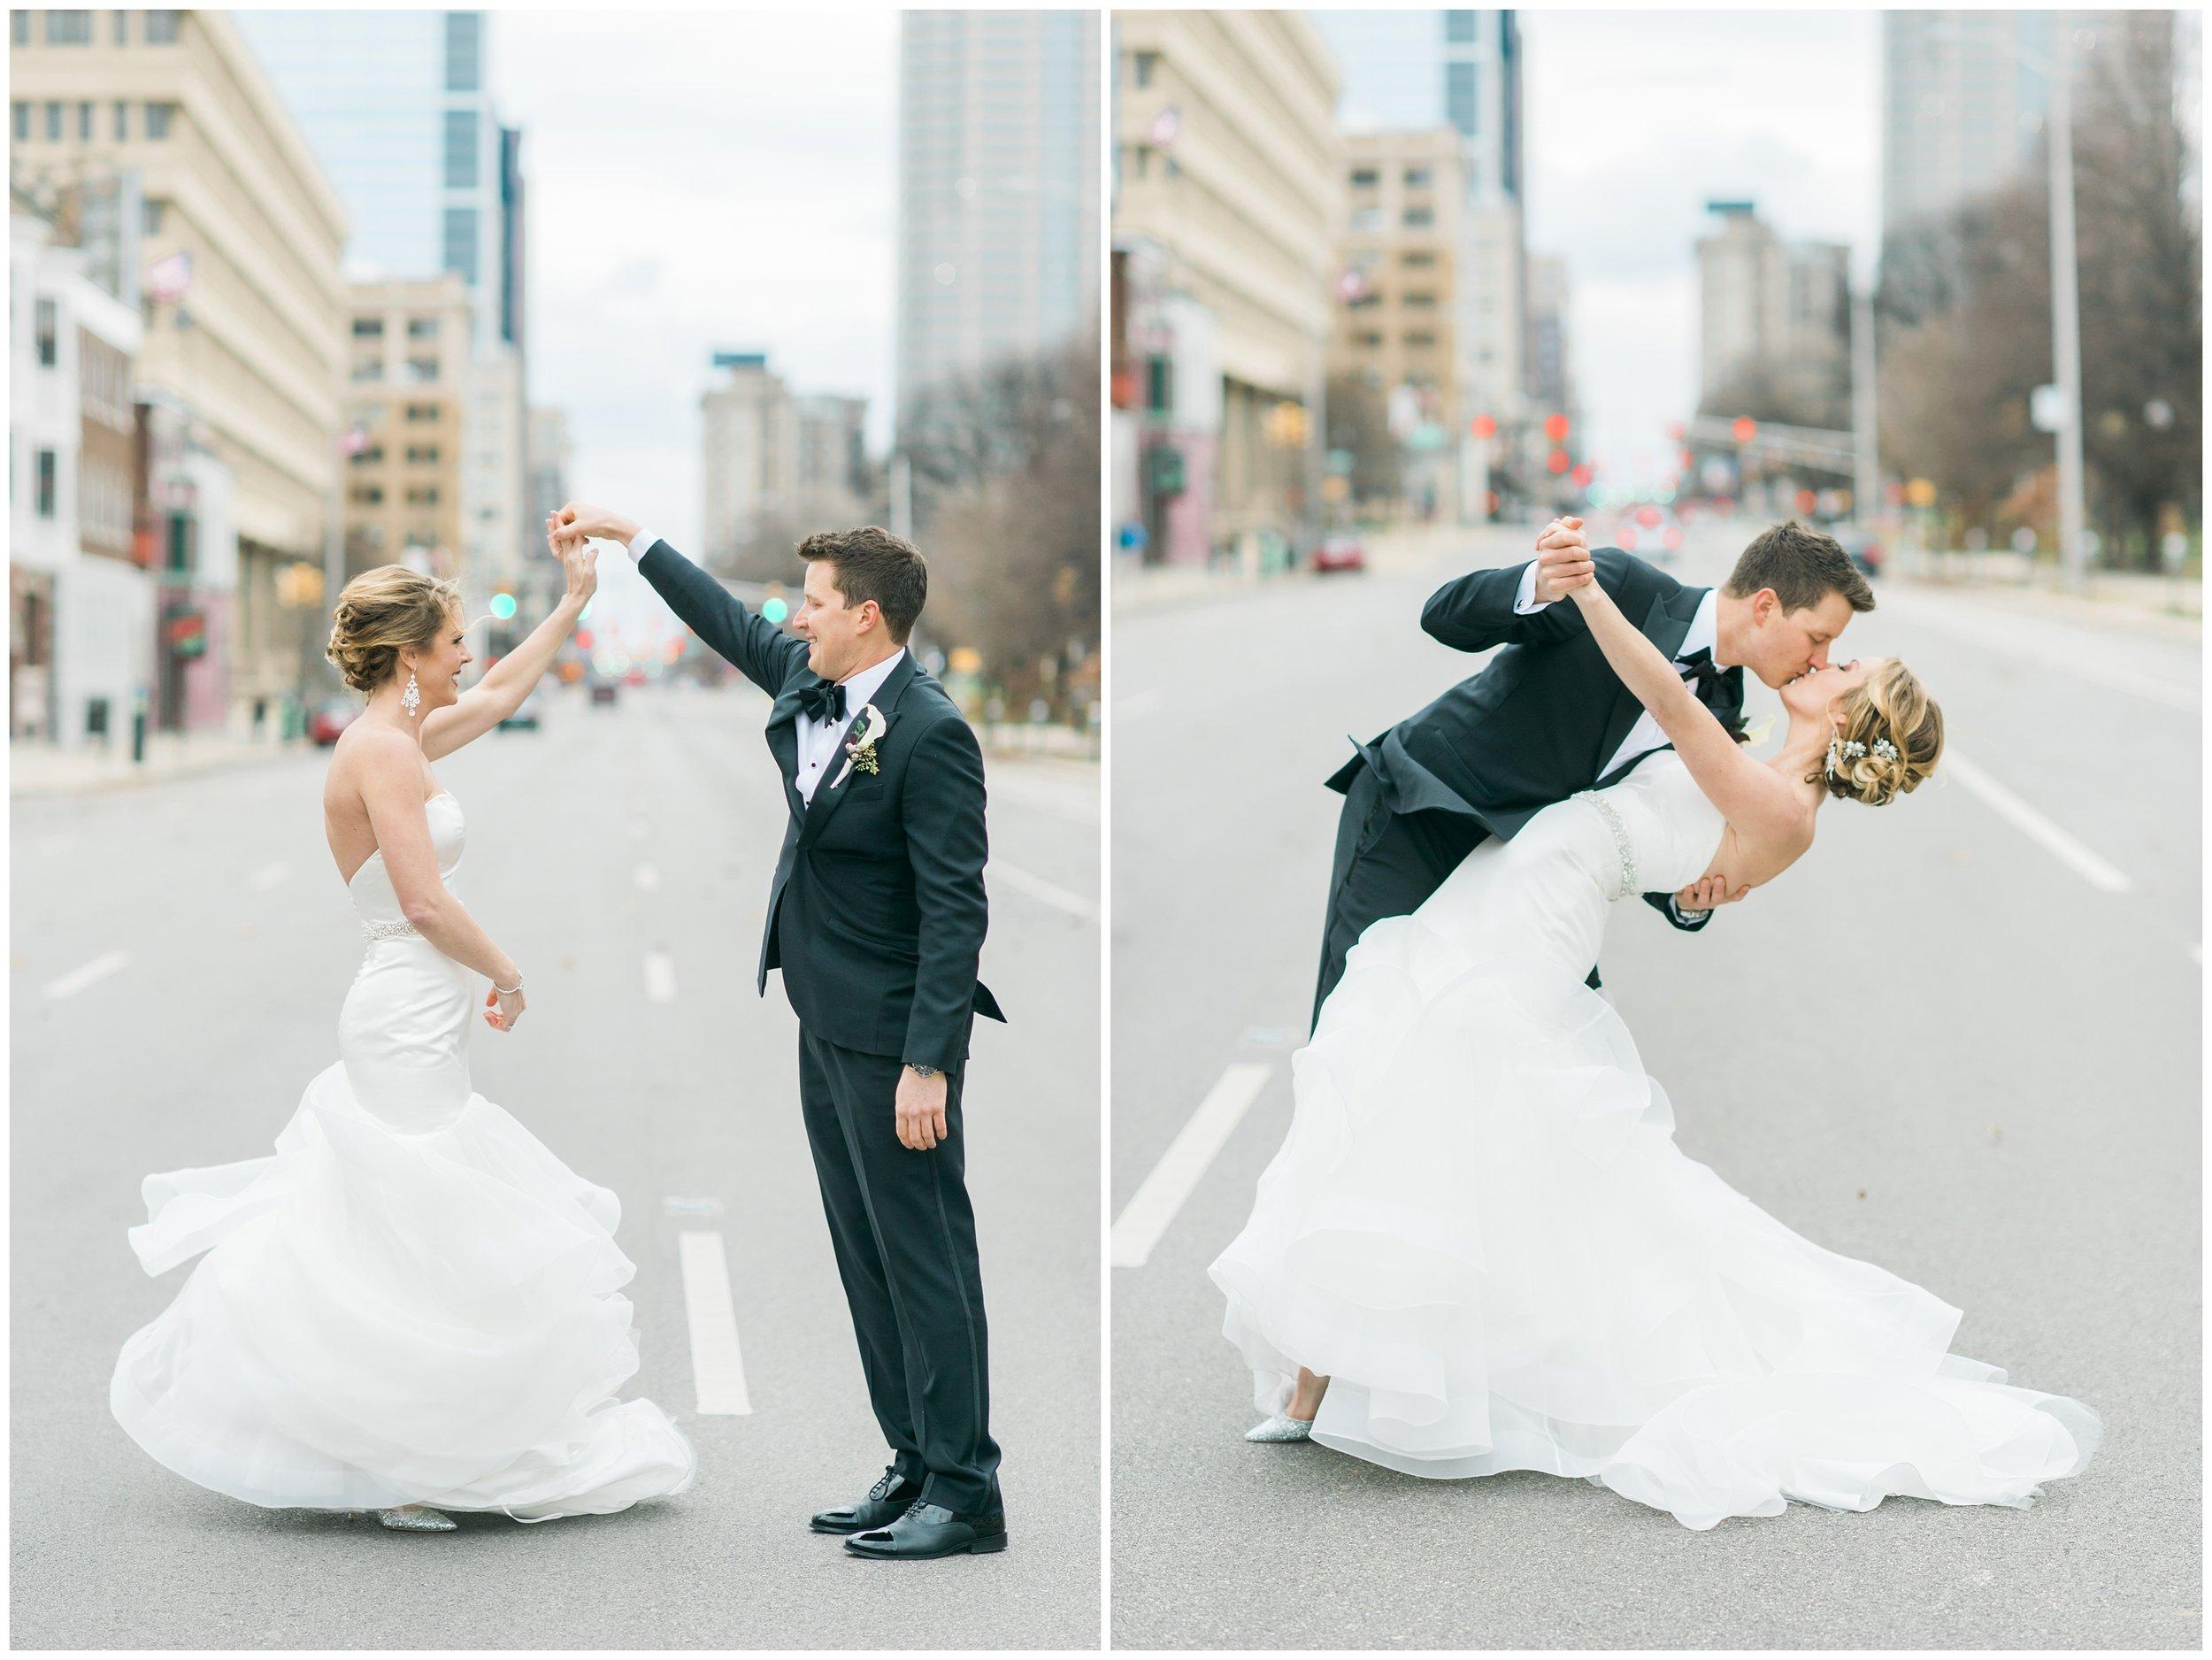 Rebecca_Bridges_Photography_Indianapolis_Wedding_Photographer_5804.jpg